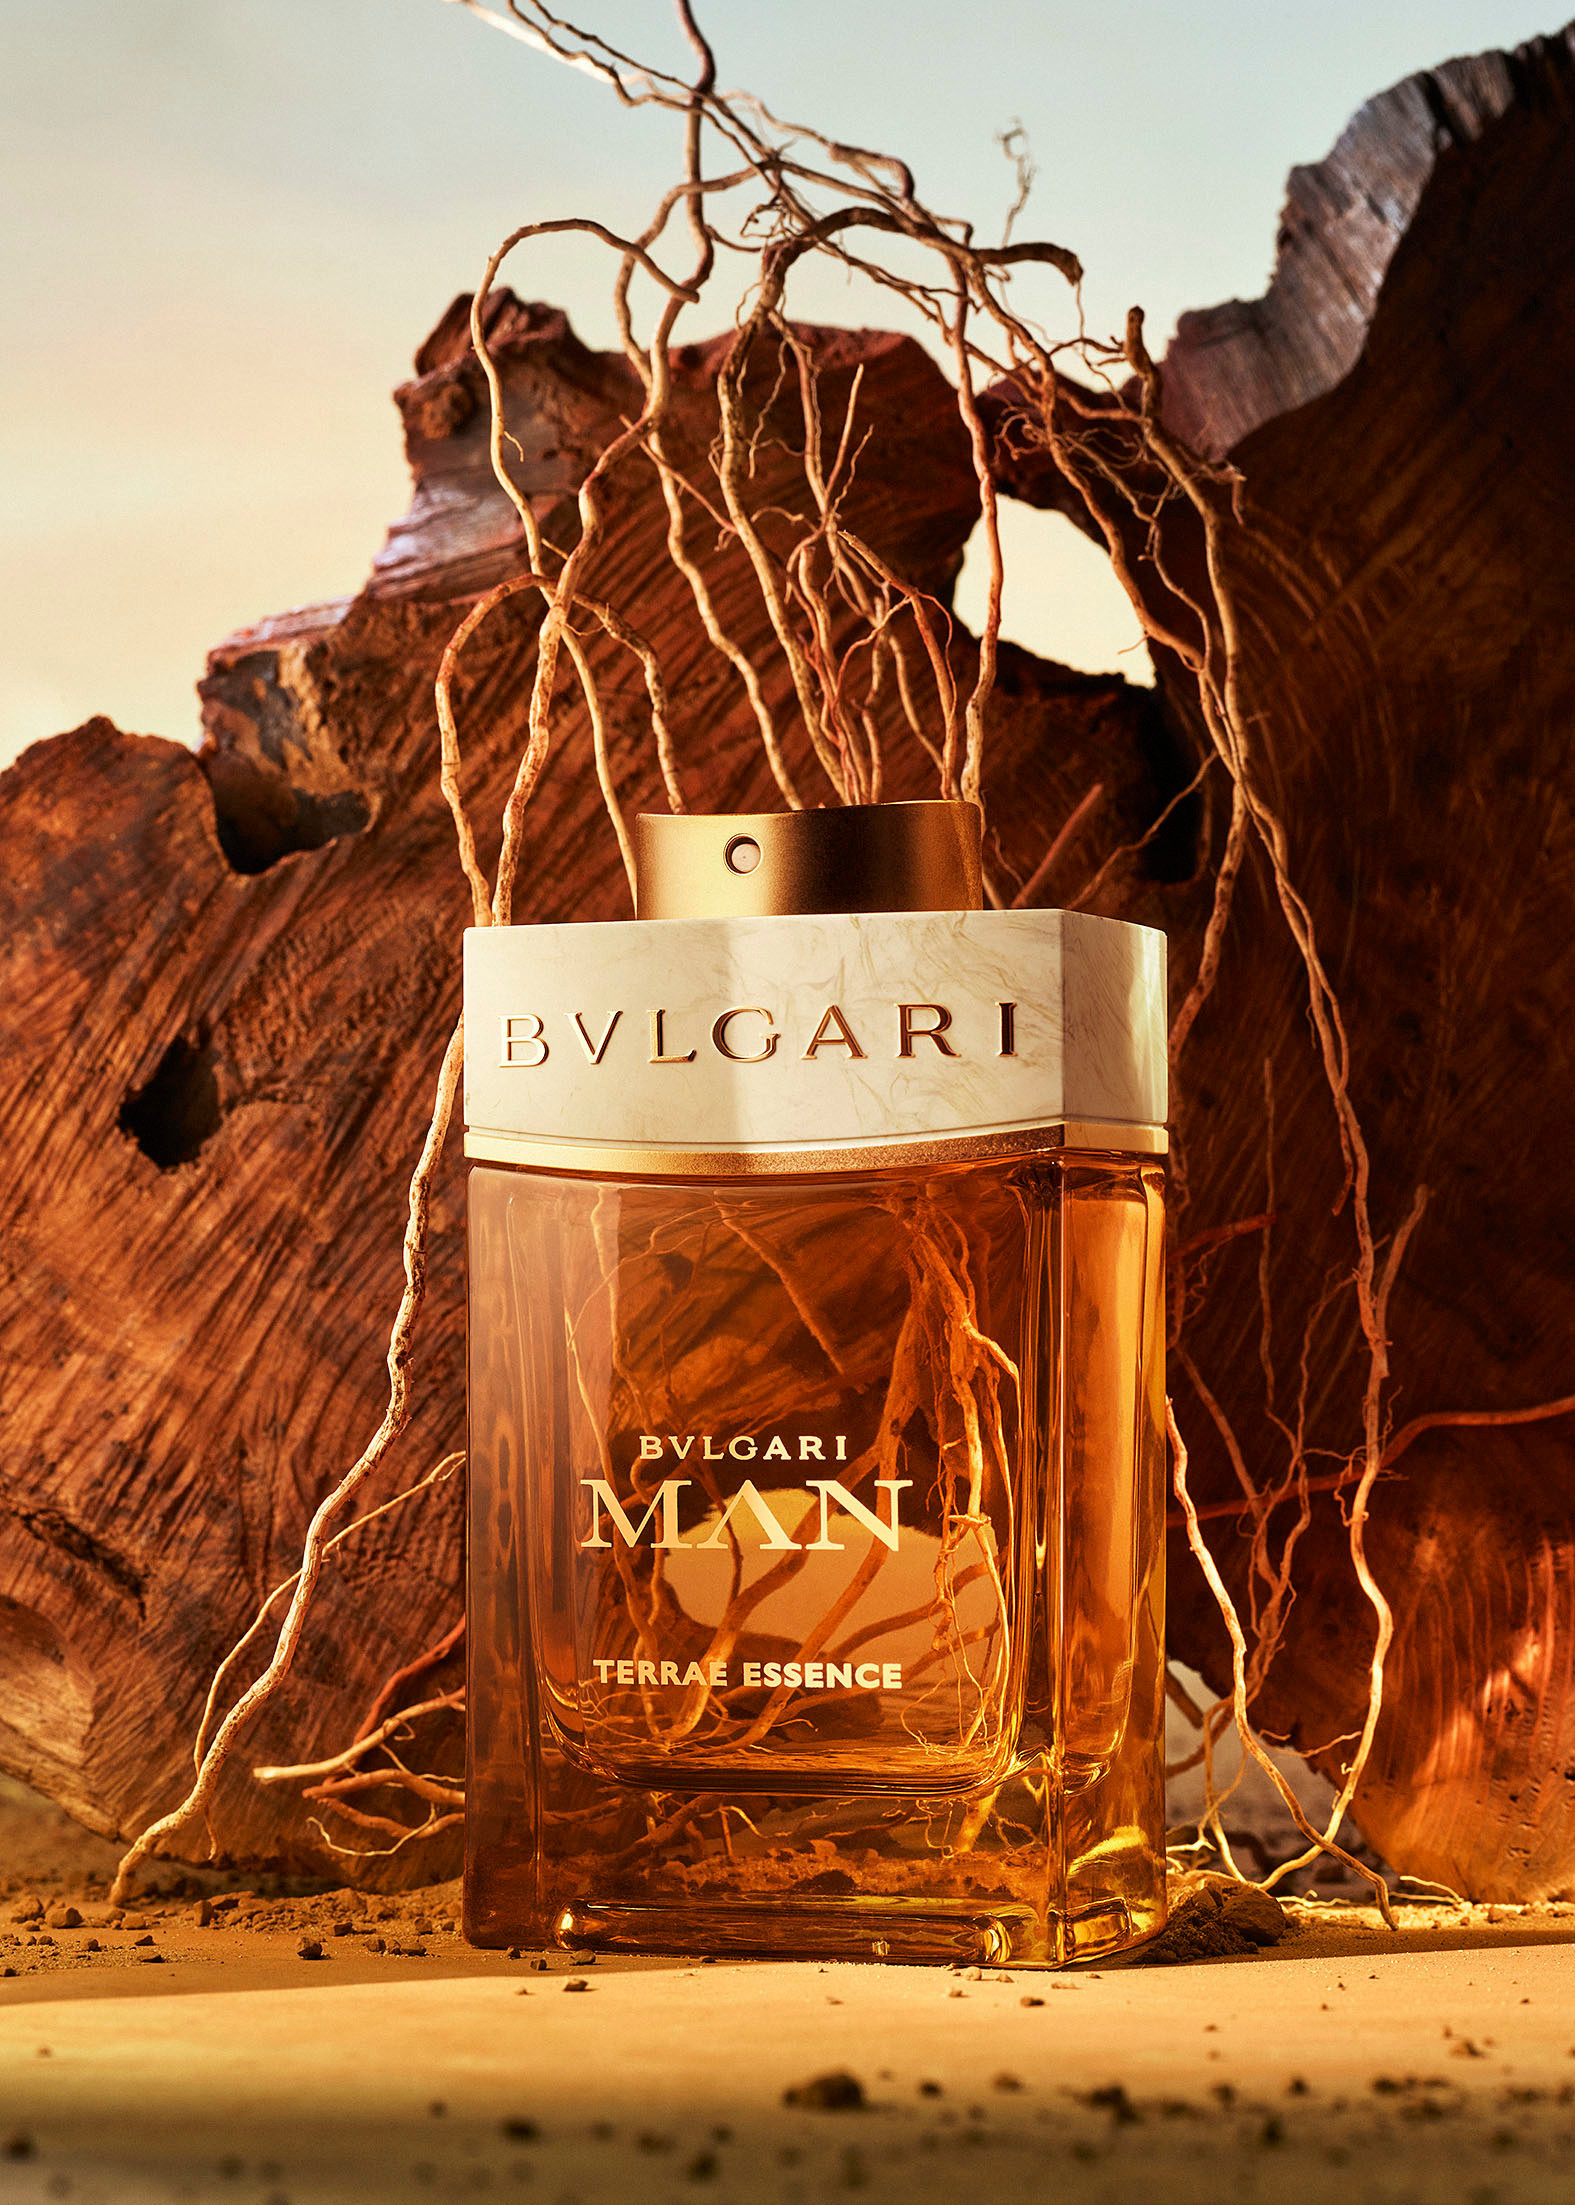 Bvlgari Man Terrae Essence Eau de Parfum, Trasparente, large image number 2